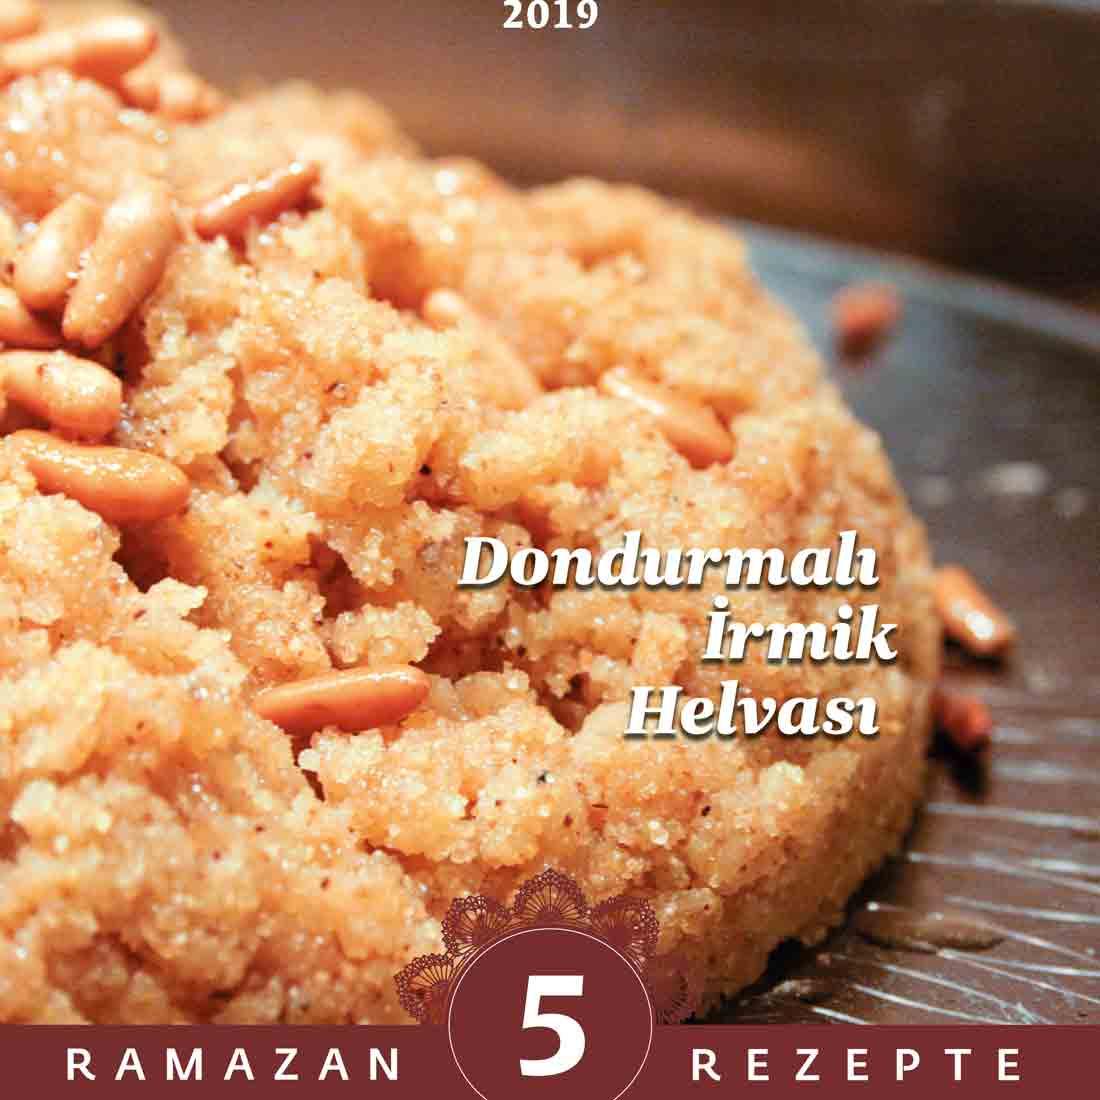 Ramadan 2019 jpeg 5